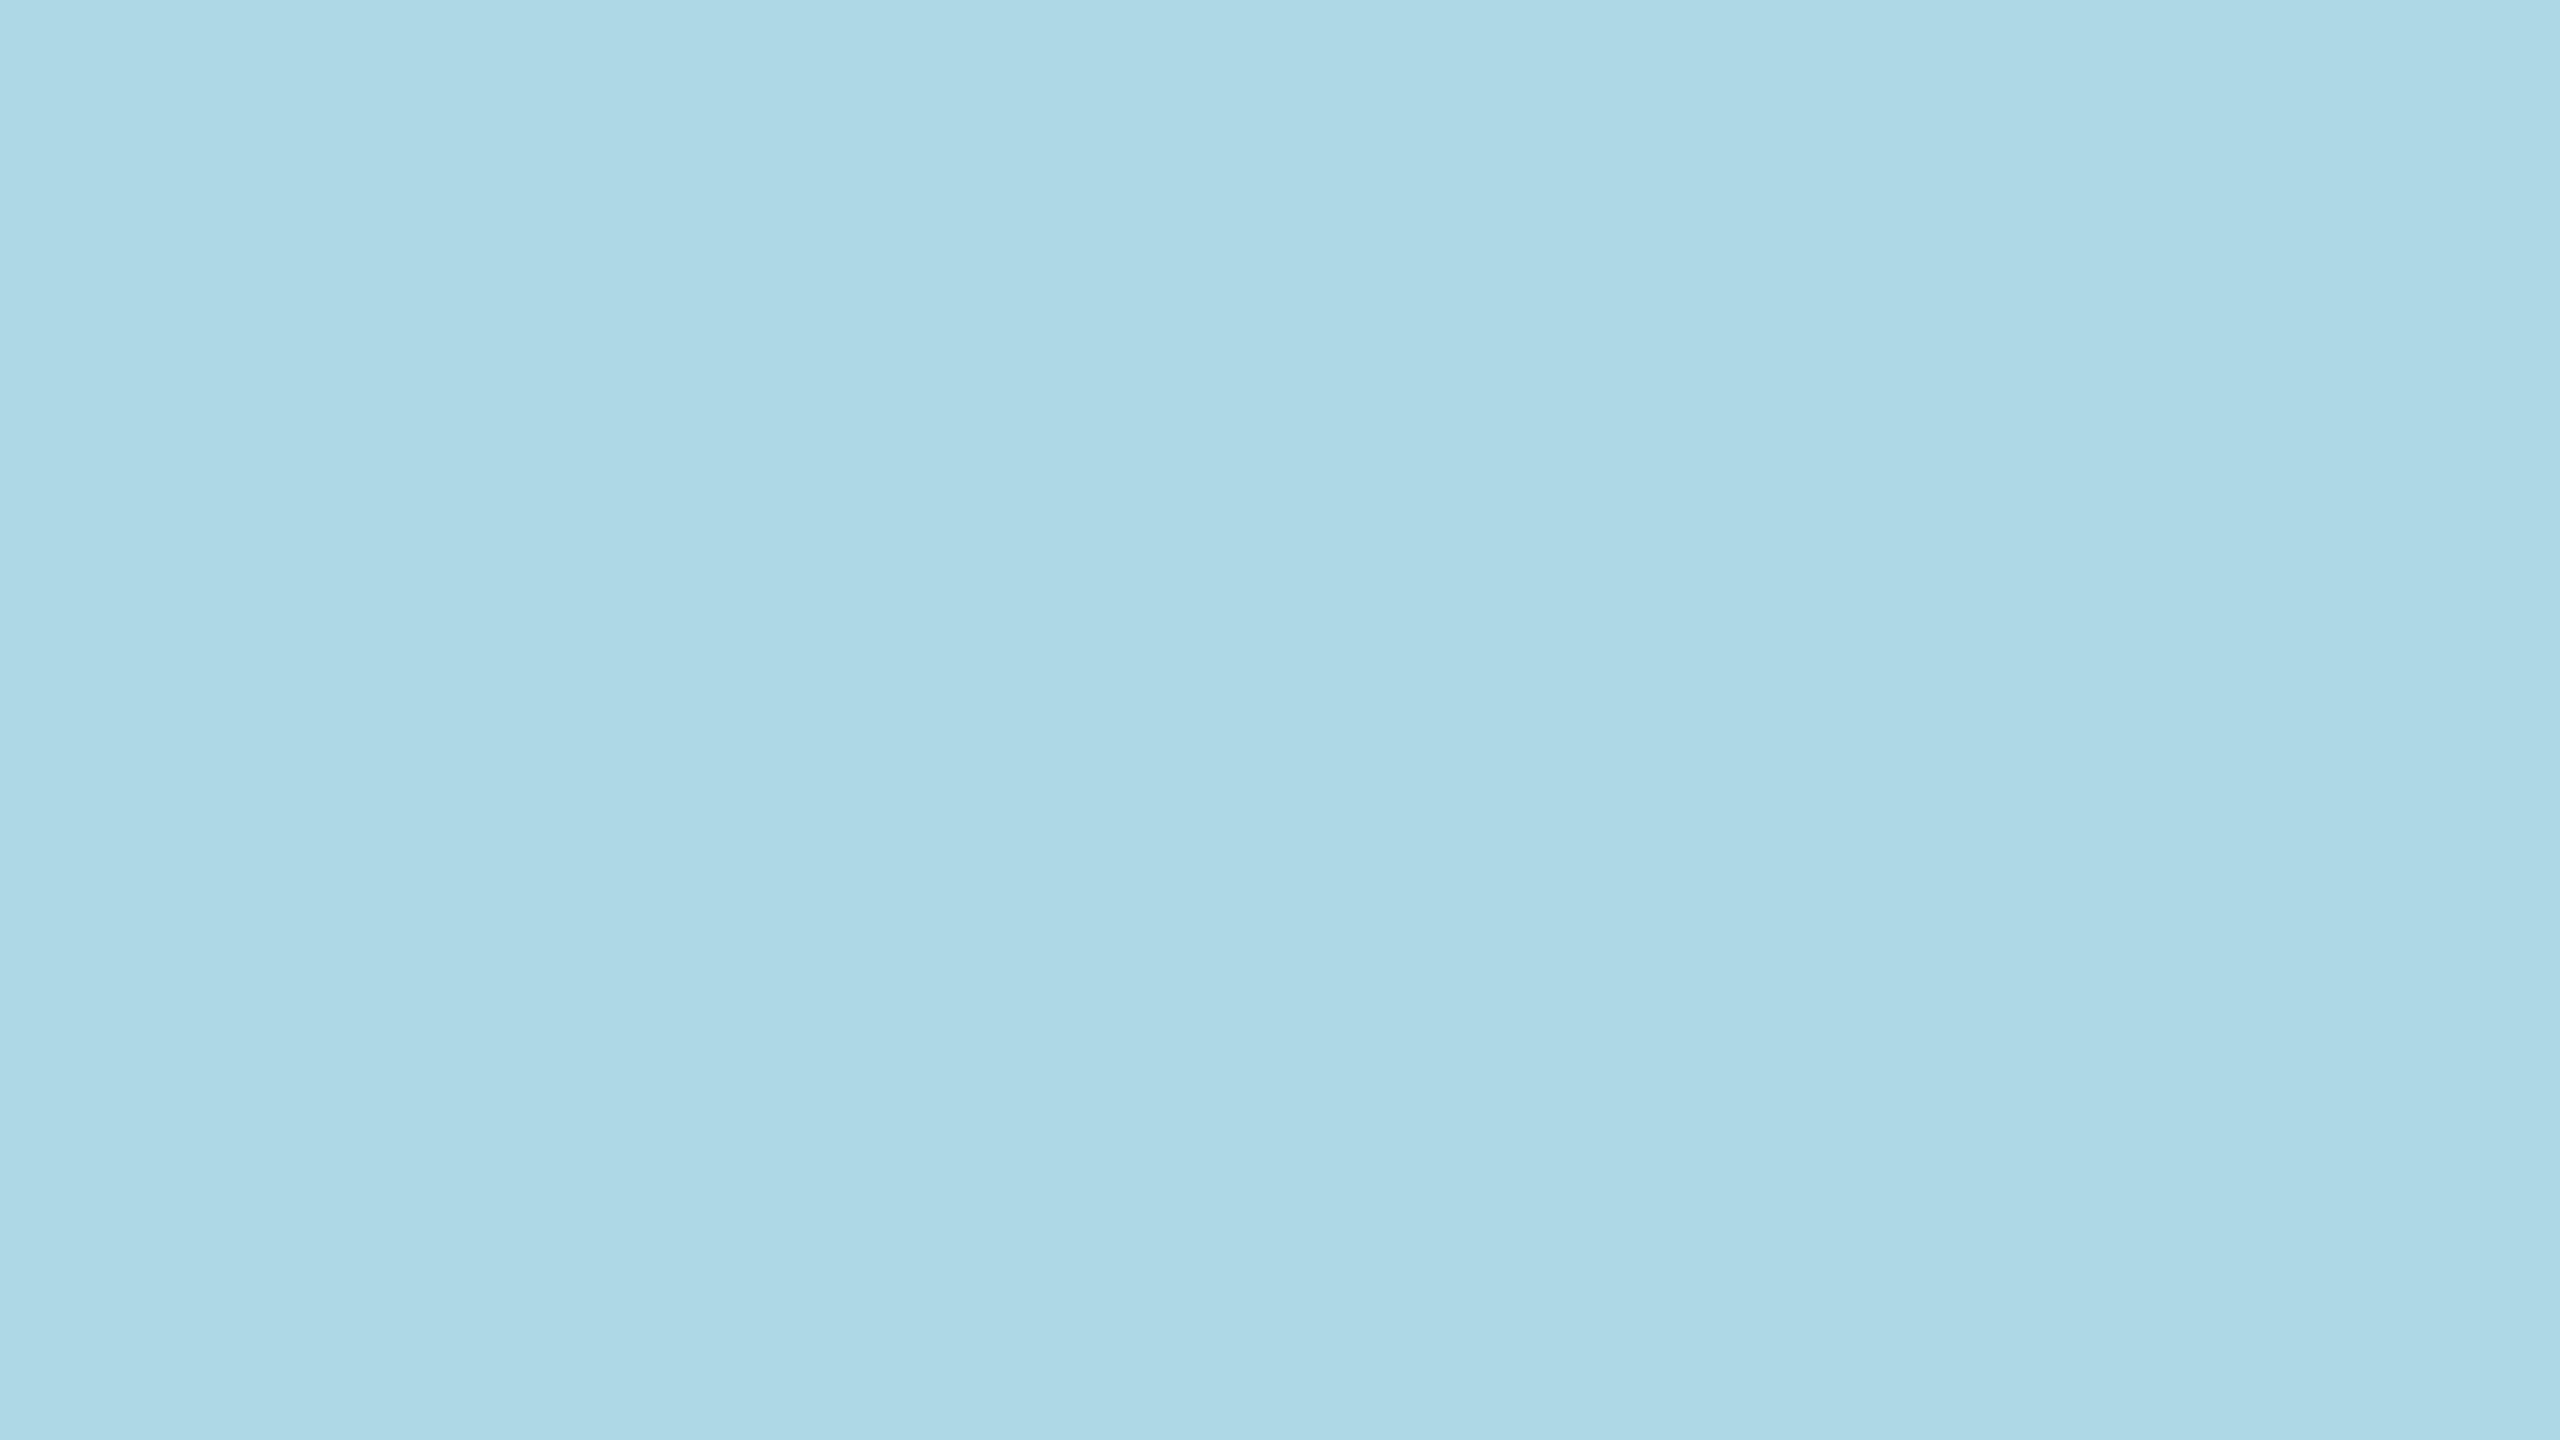 2560x1440 Light Blue Solid Color Background